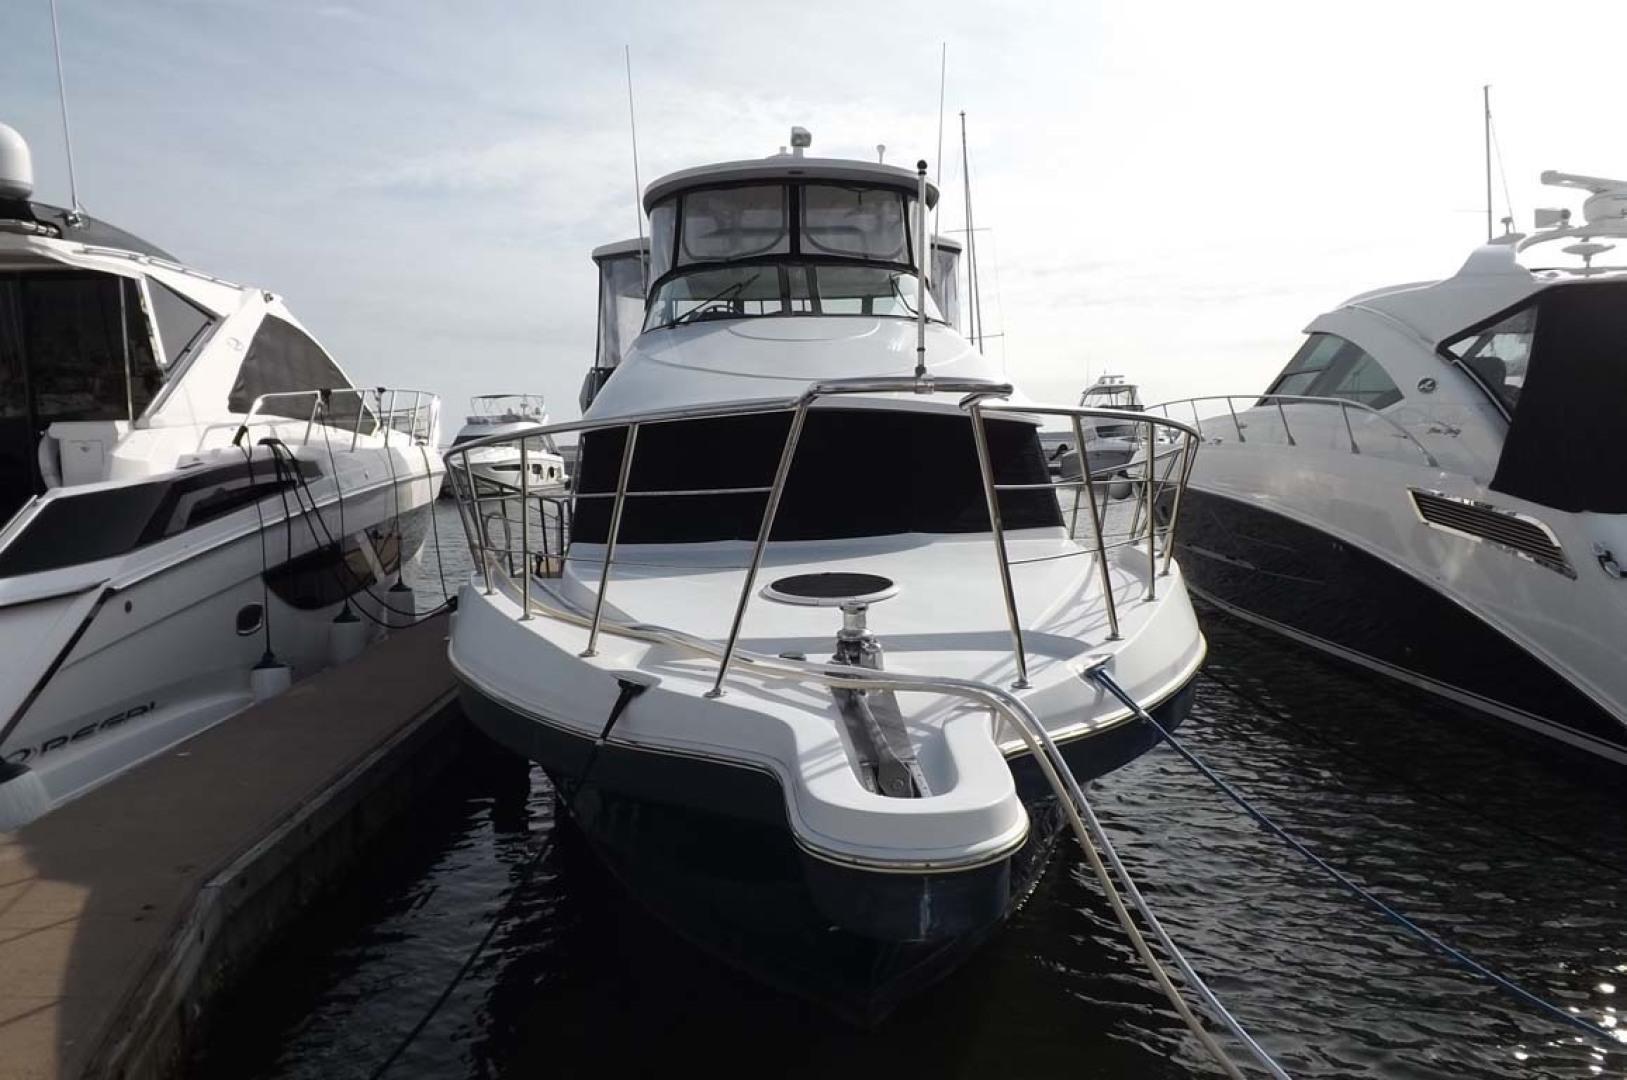 Bluewater Yachts-5200 2006 -Mount Pleasant-South Carolina-United States-Bow Profile-1412956 | Thumbnail